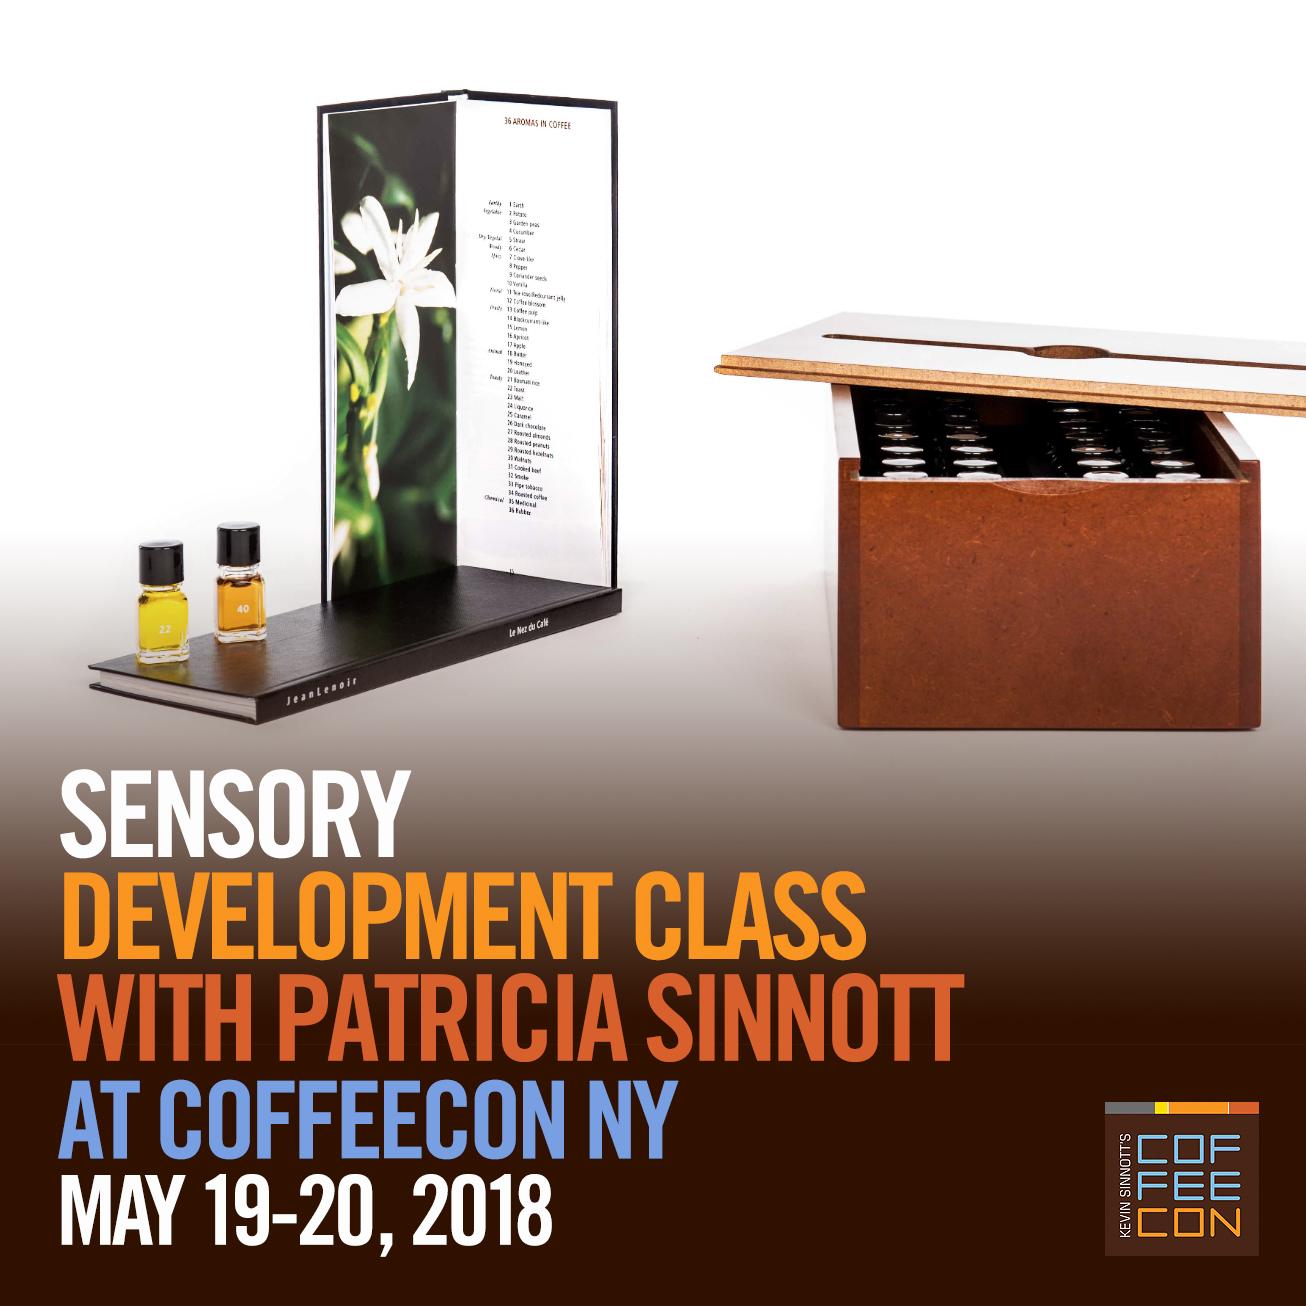 Sensory Development Class at CoffeeConNY